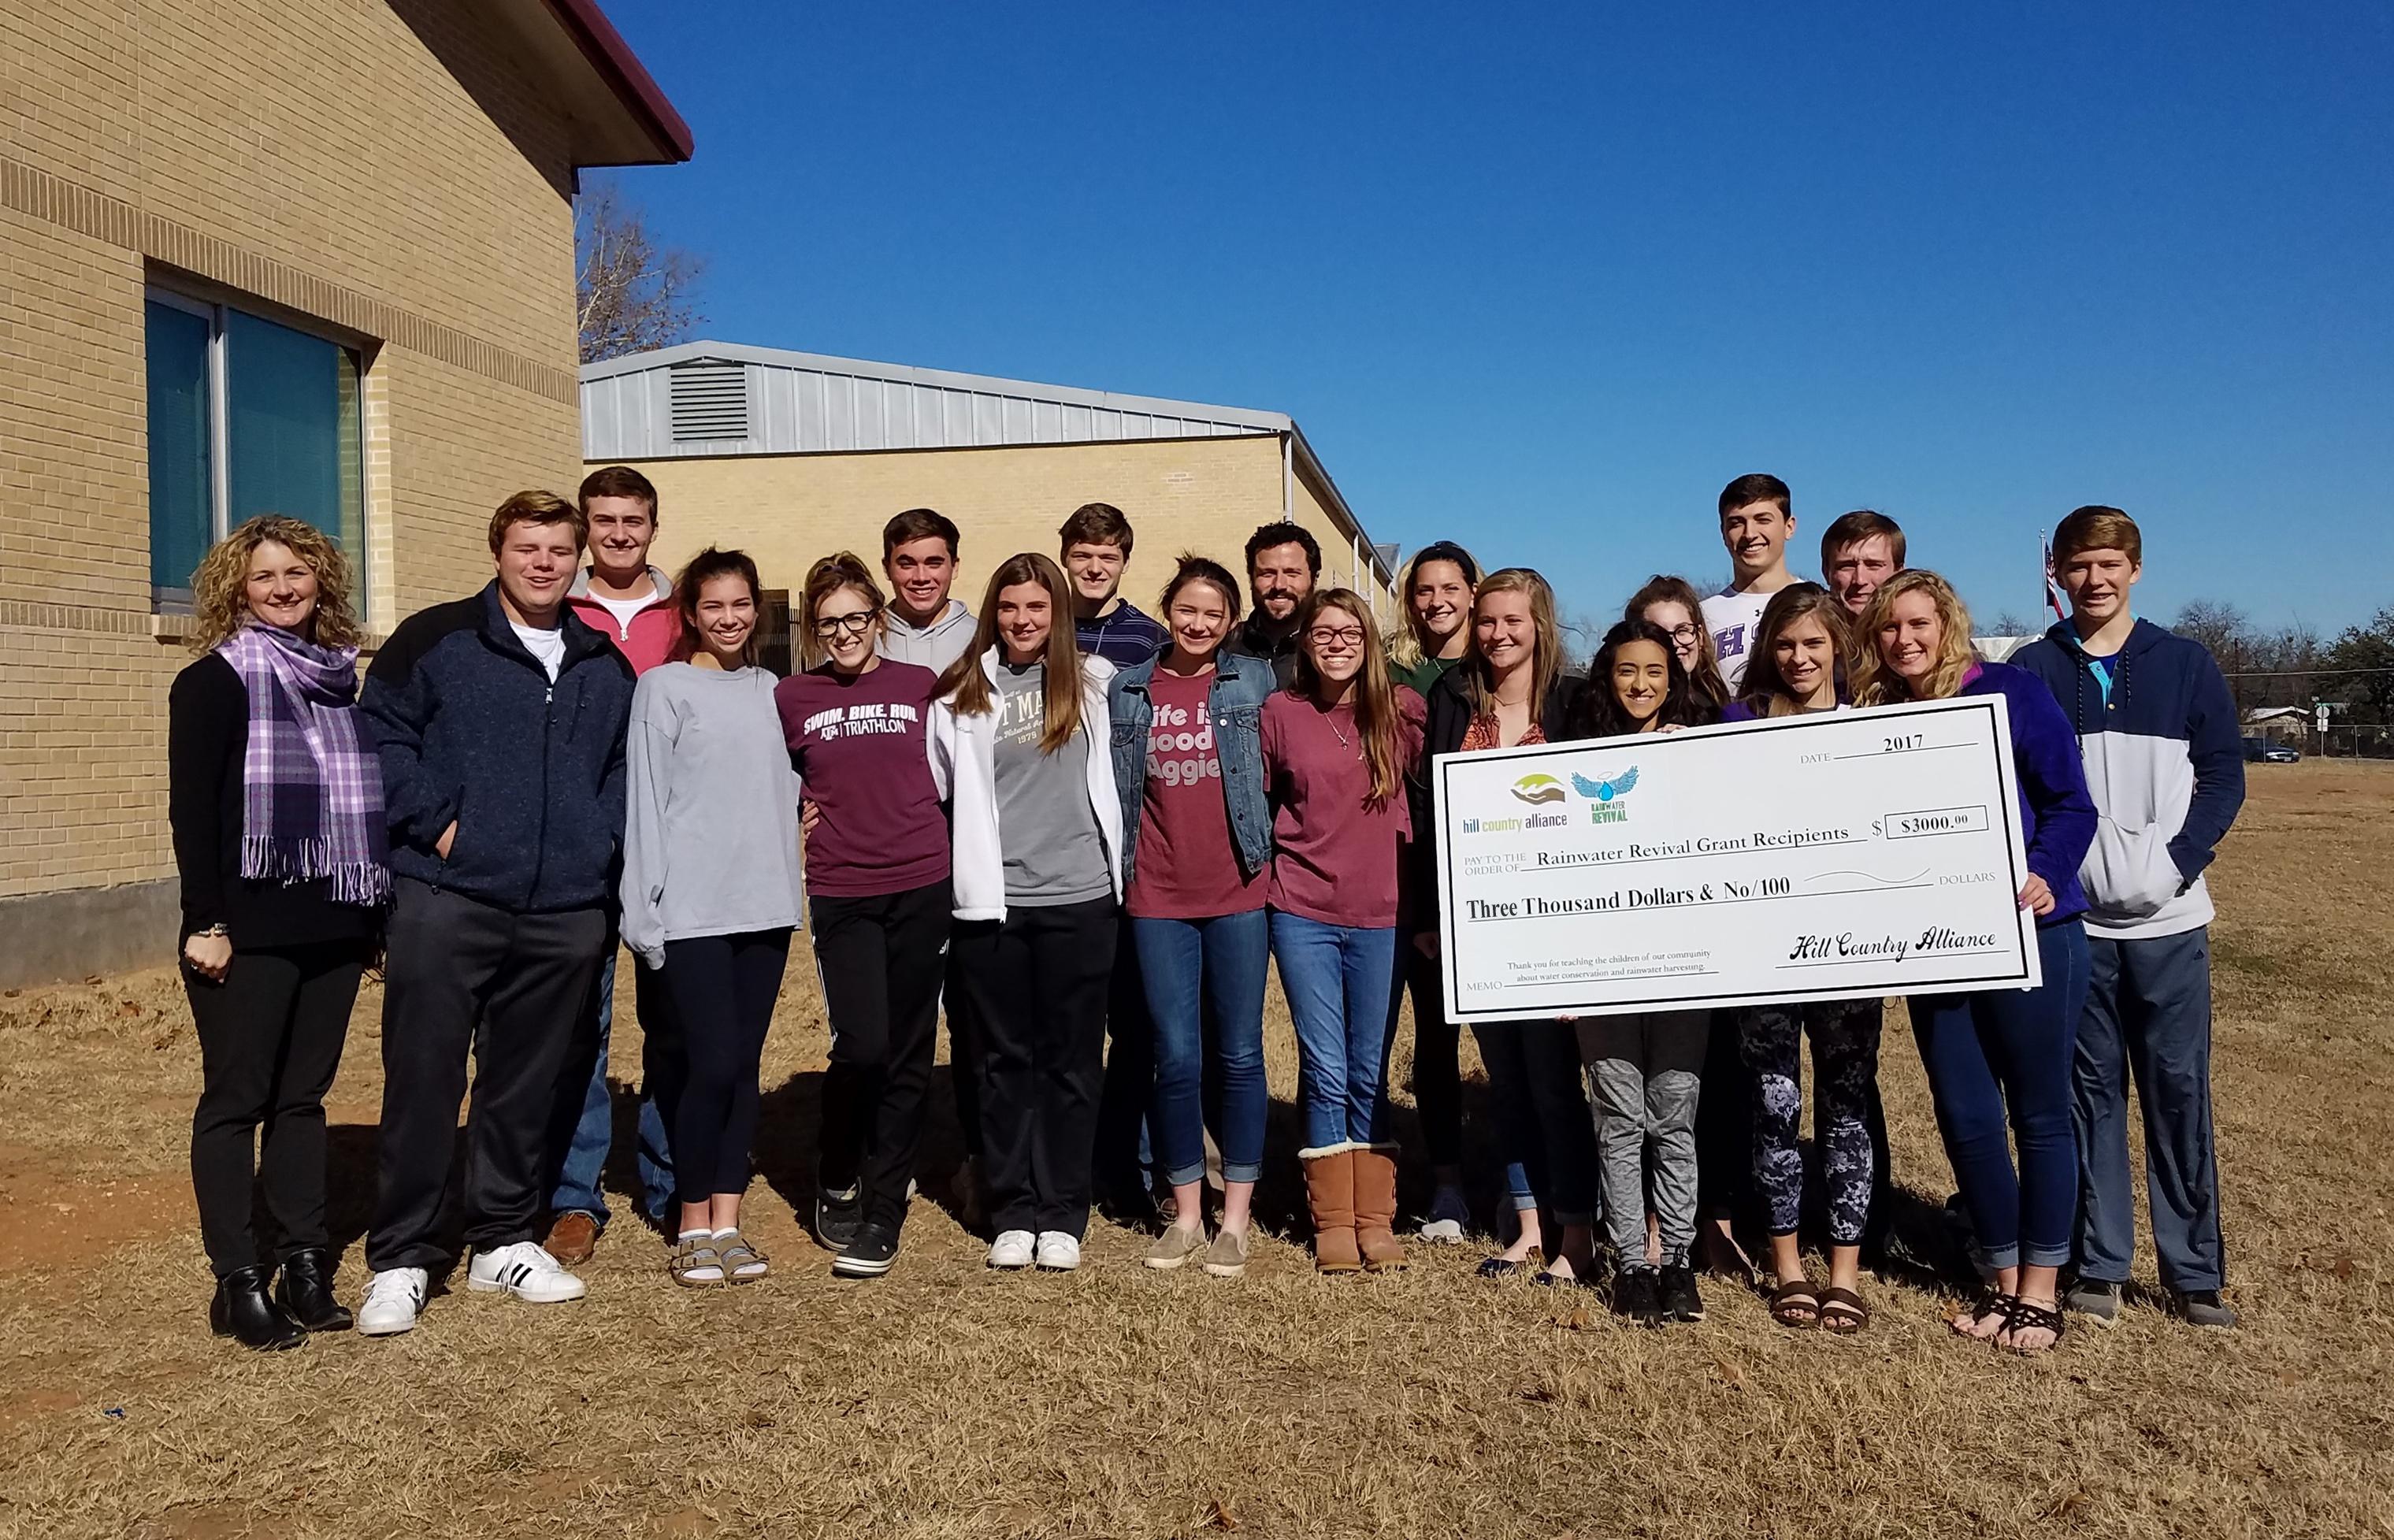 The Mason High School Pioneers Youth Leadership Class